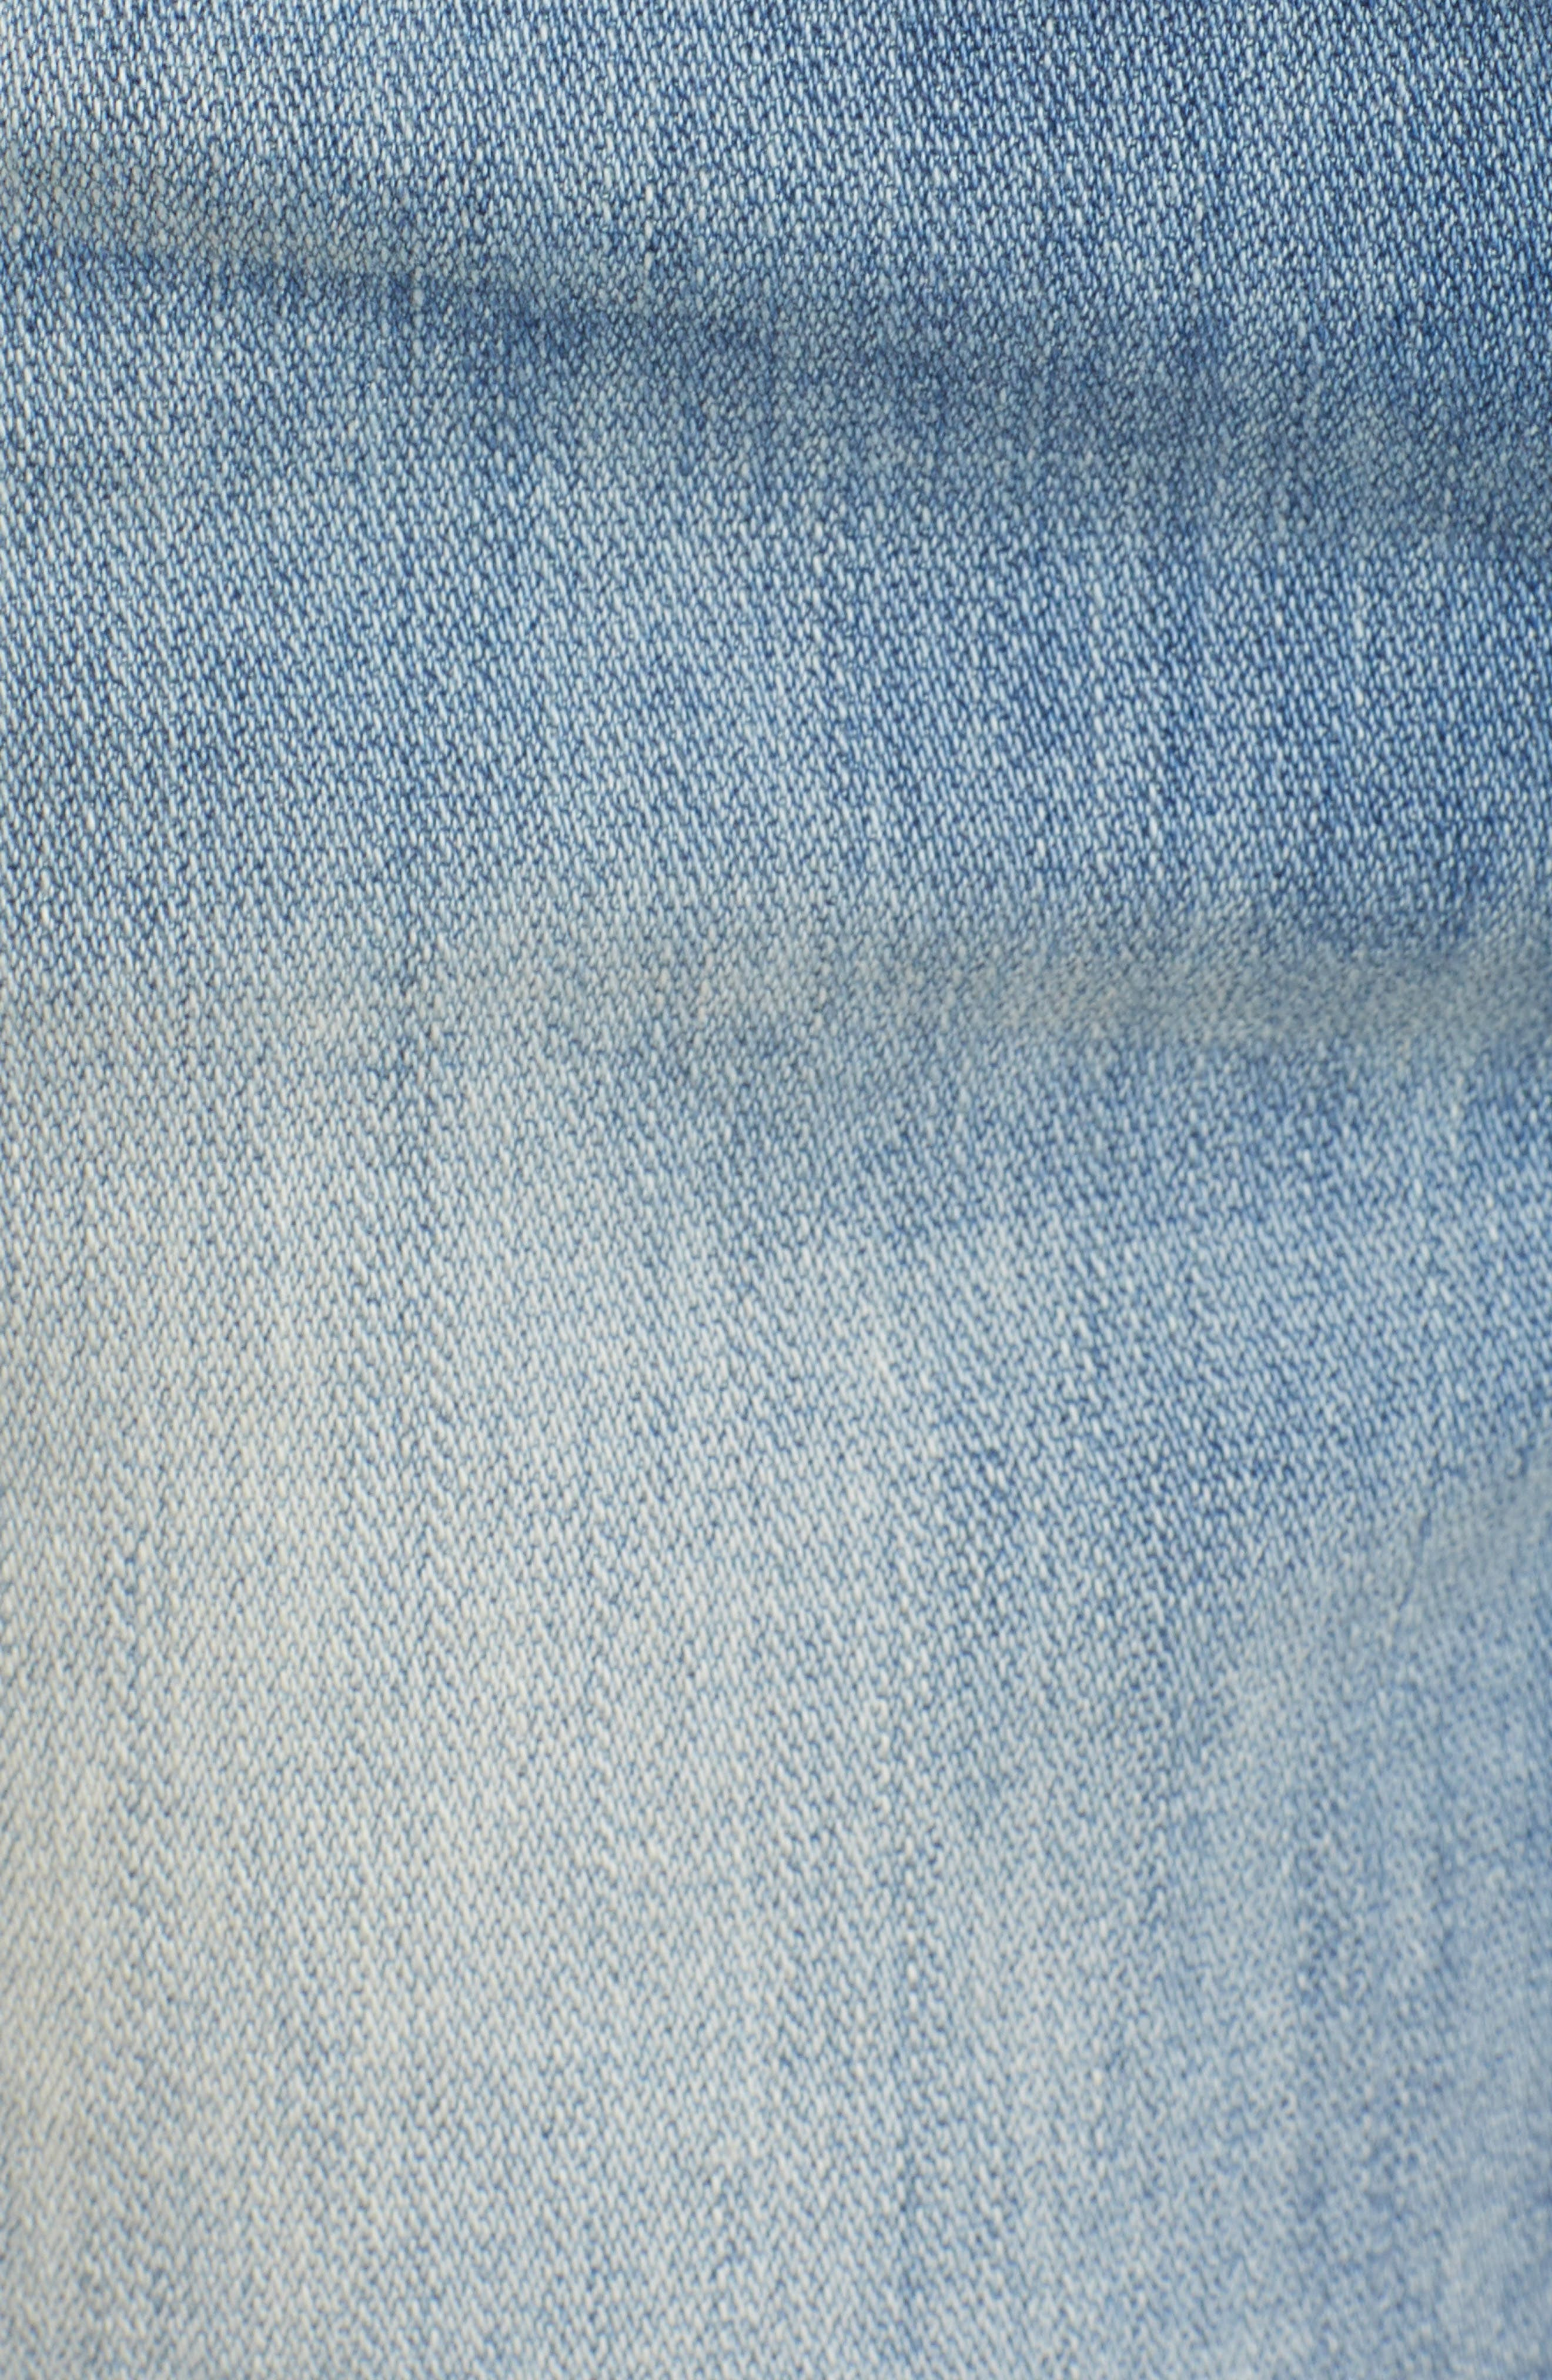 Fray Outseam Denim Shorts,                             Alternate thumbnail 6, color,                             420